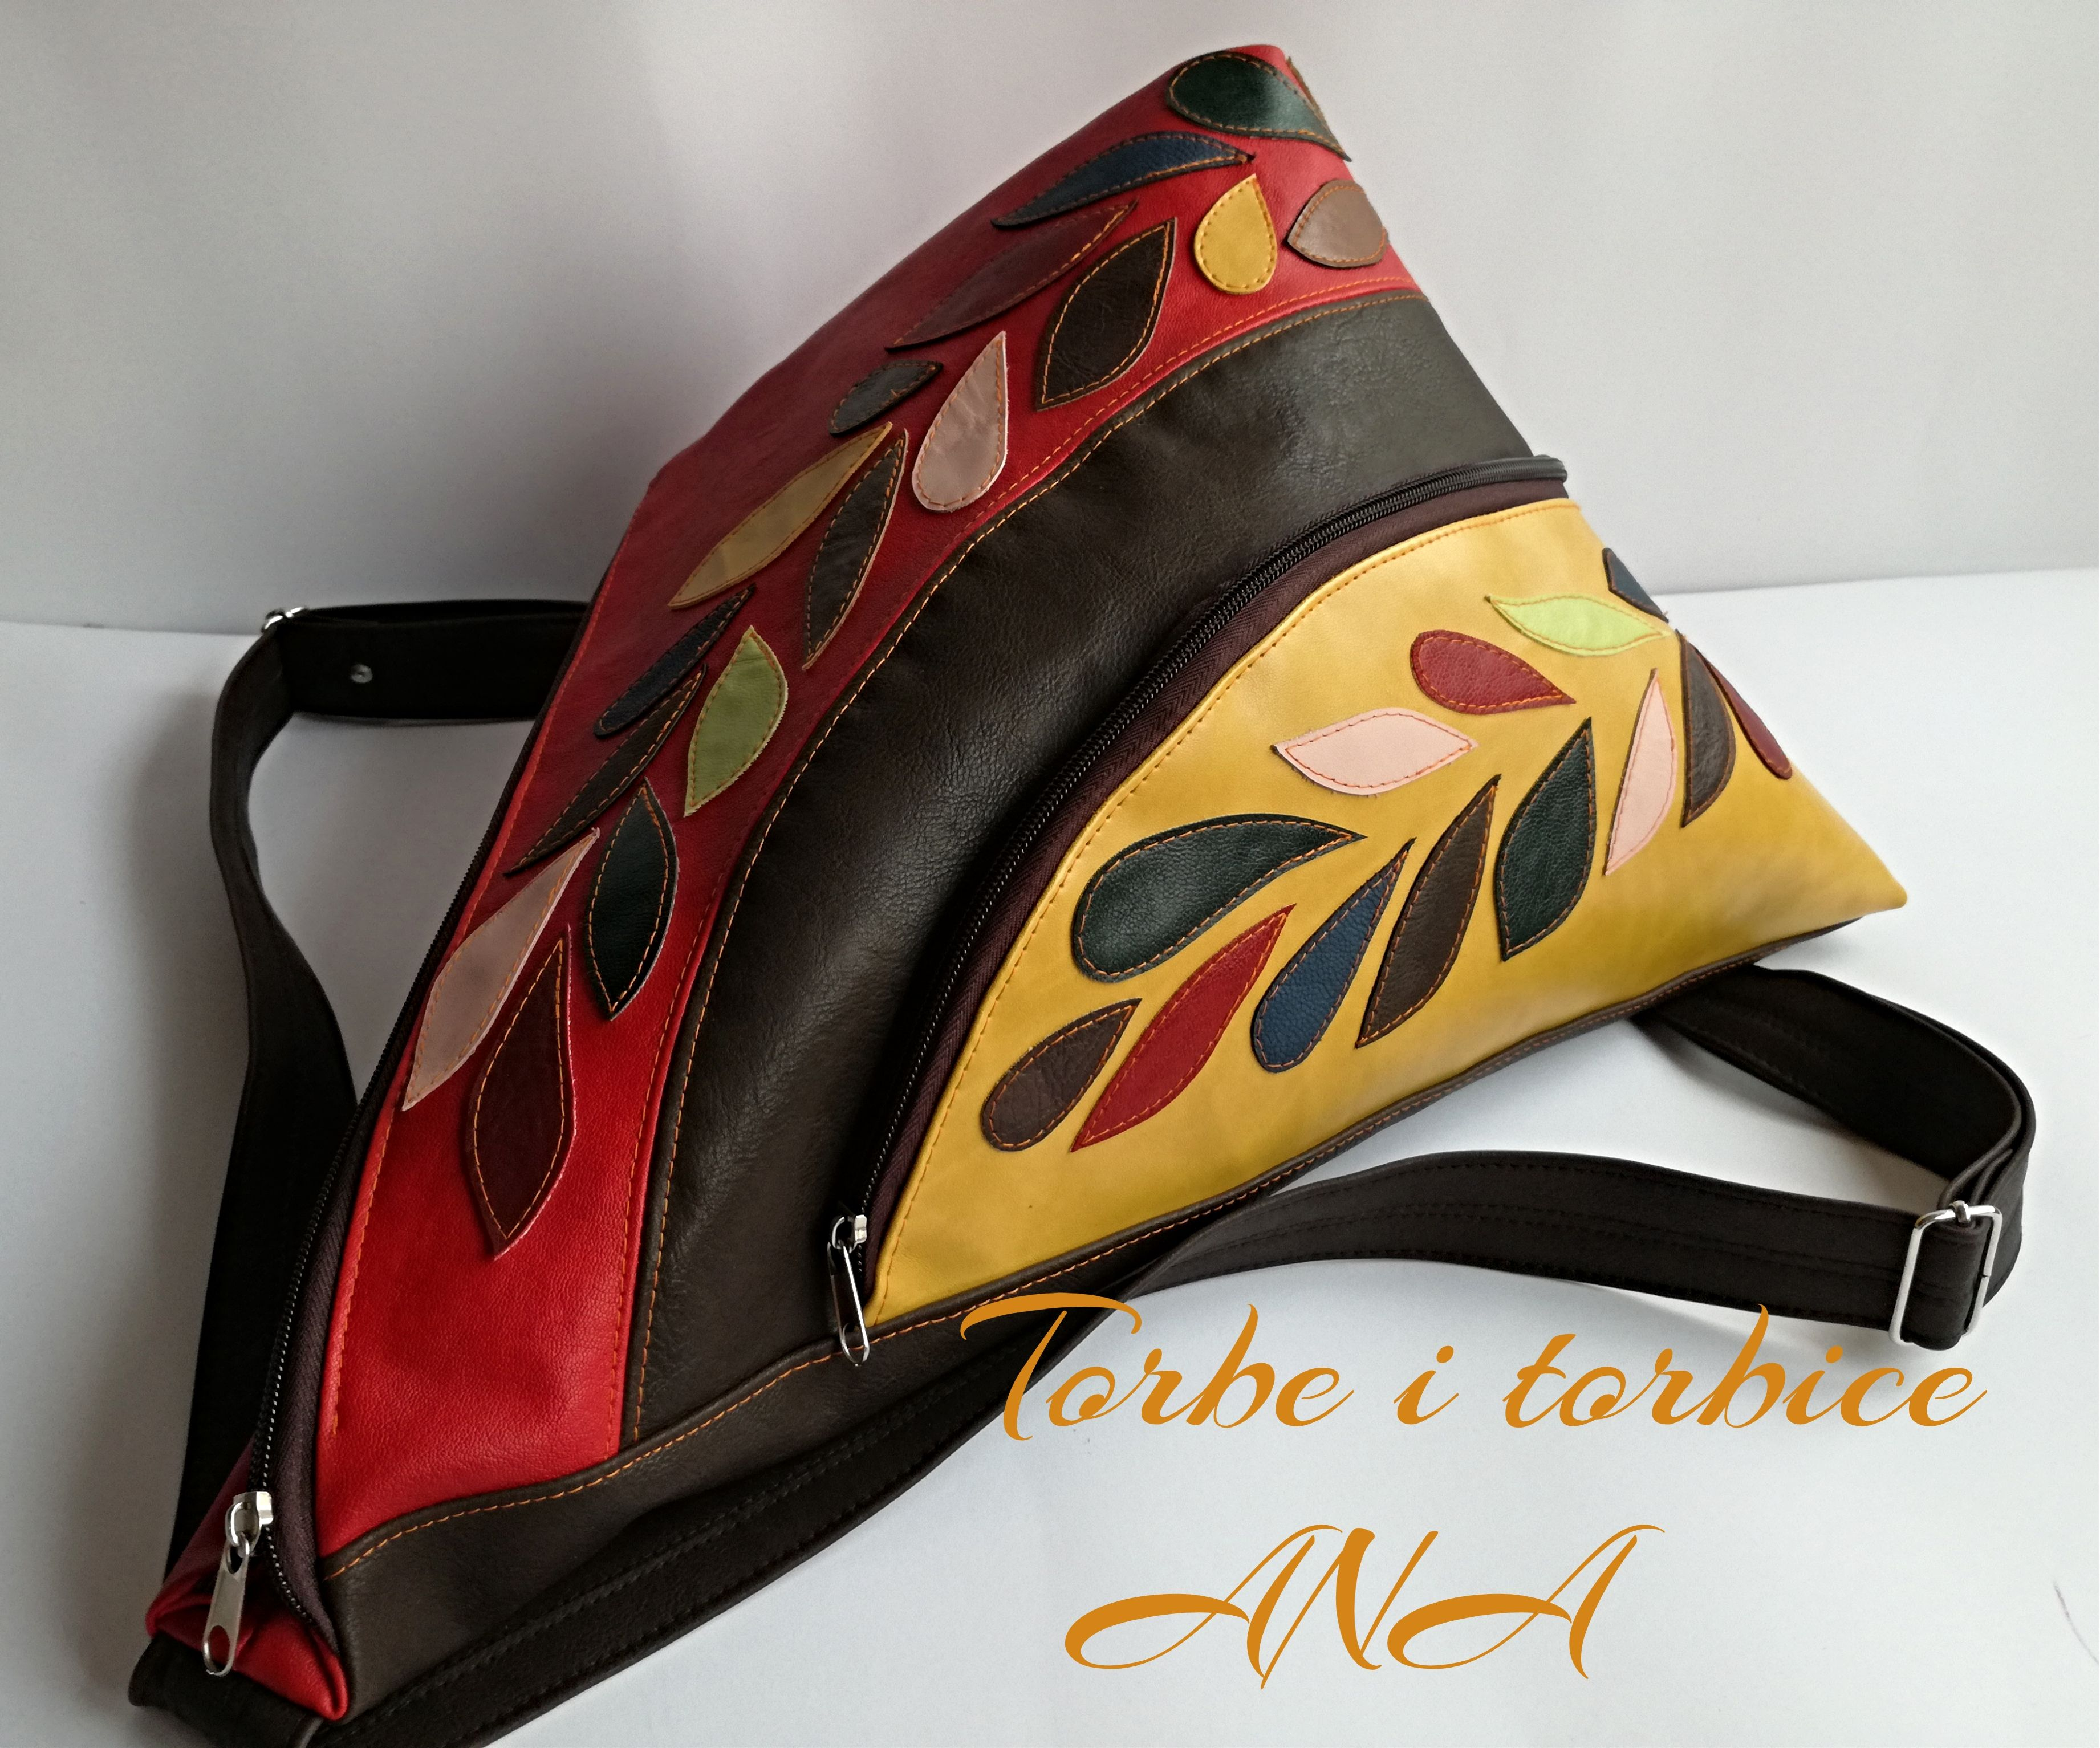 Pin by Ana Bags on Ana bags(backpacks) Bags, Backpacks